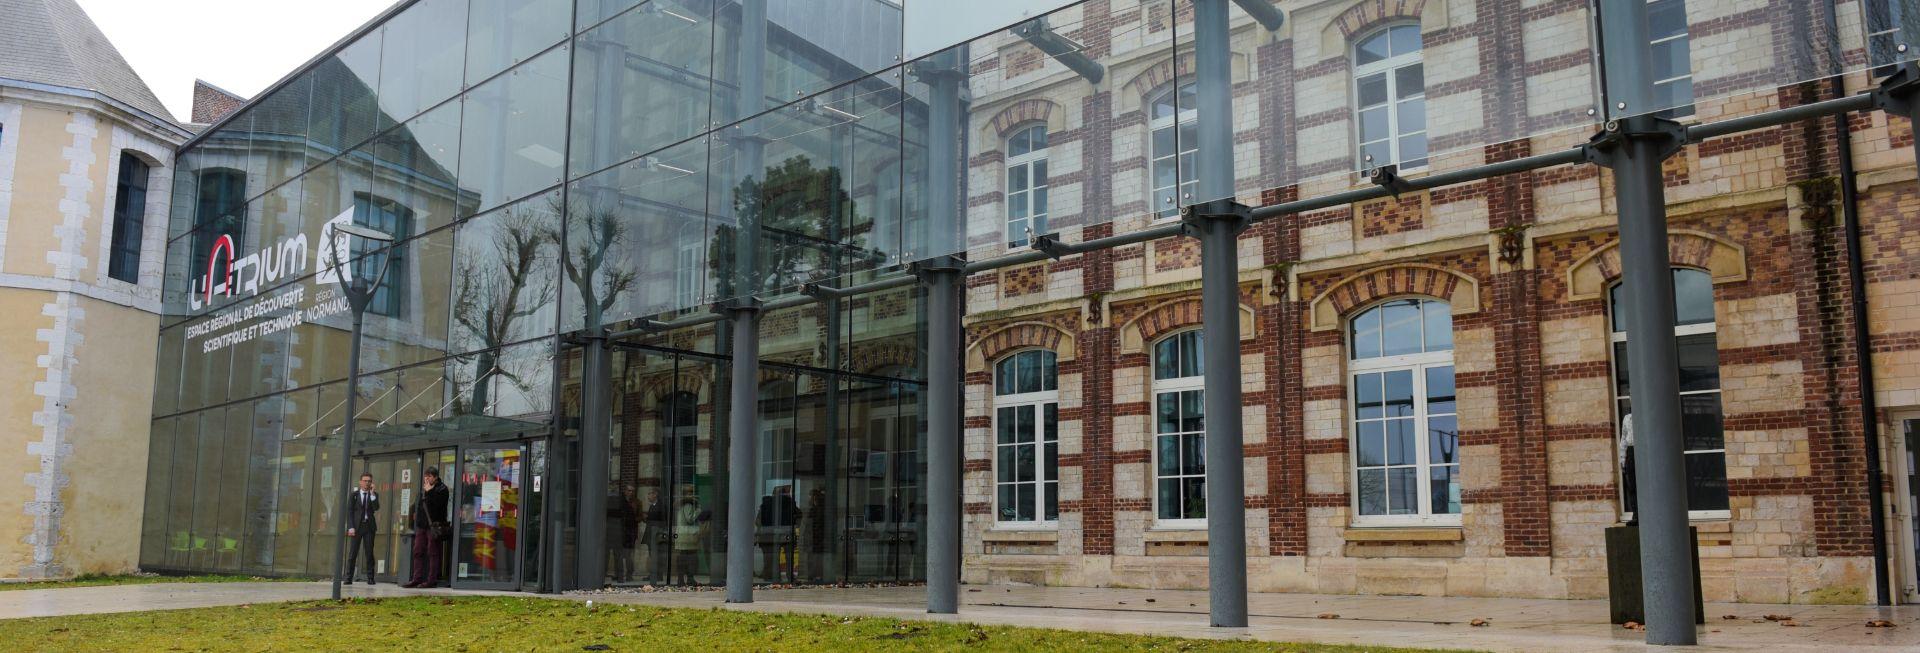 L'Atrium de Rouen